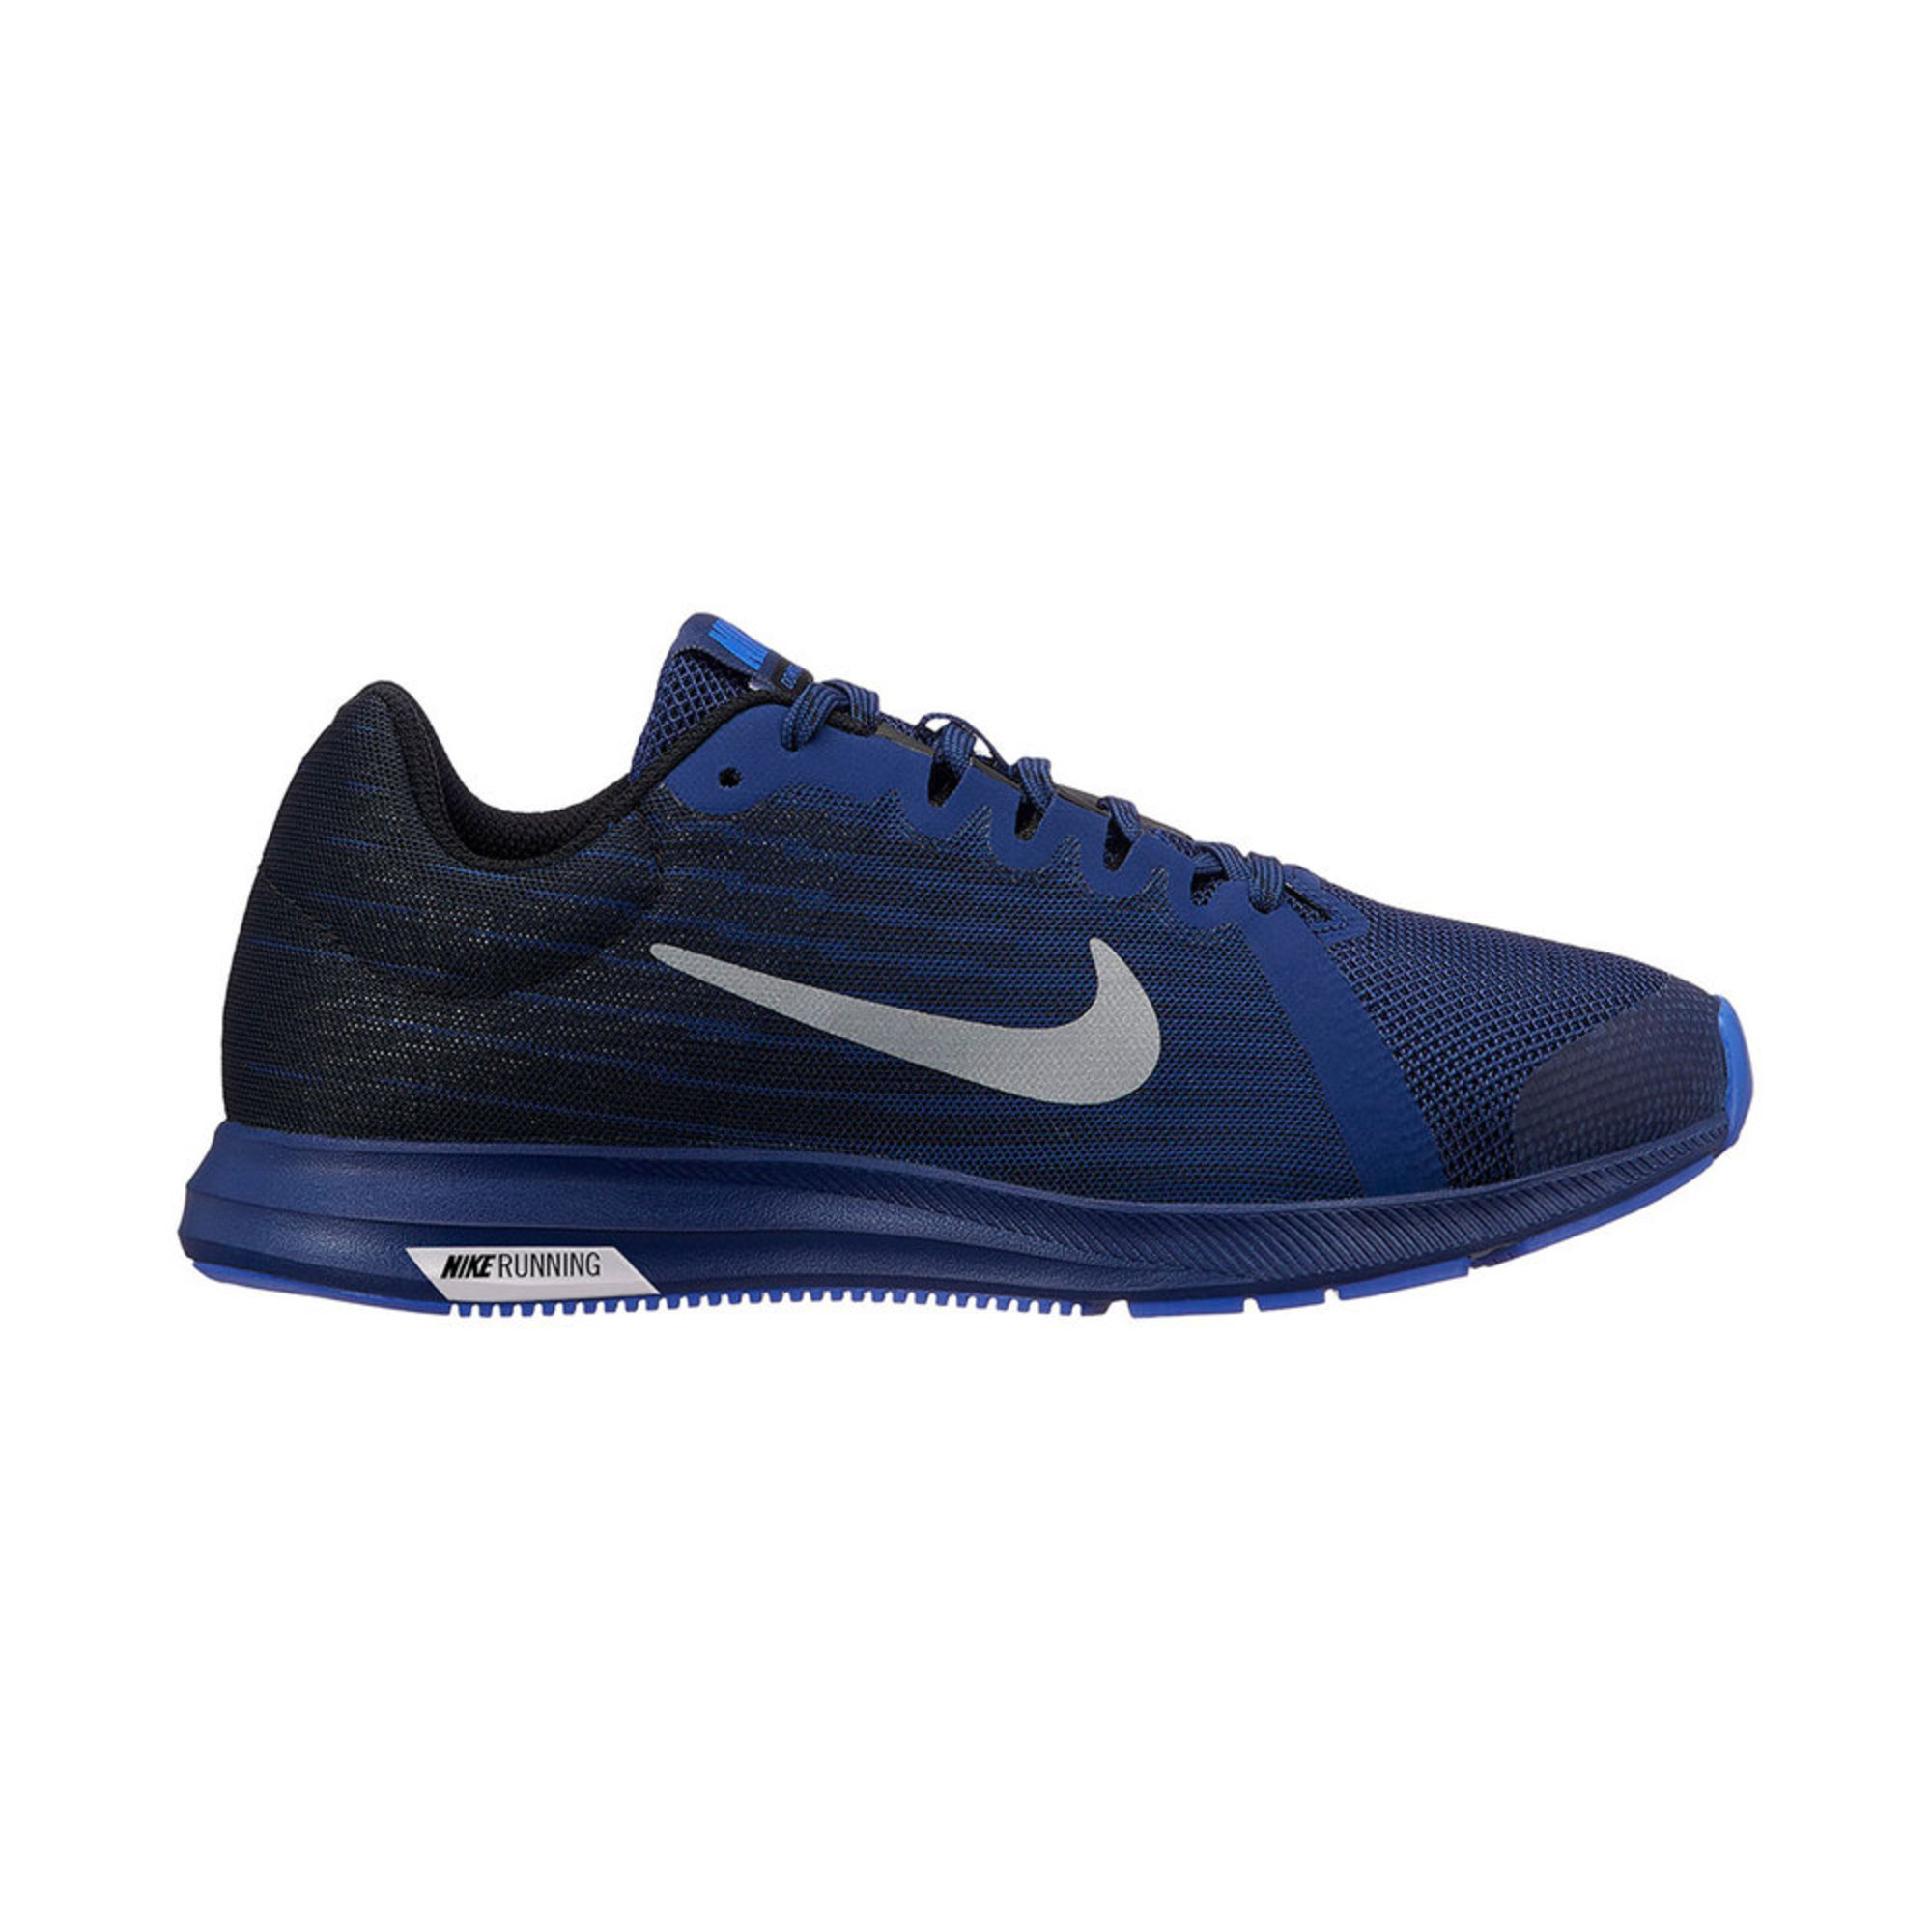 Nike. Nike Boys Downshifter 8 RFK Running Shoe ... 59530b747b0